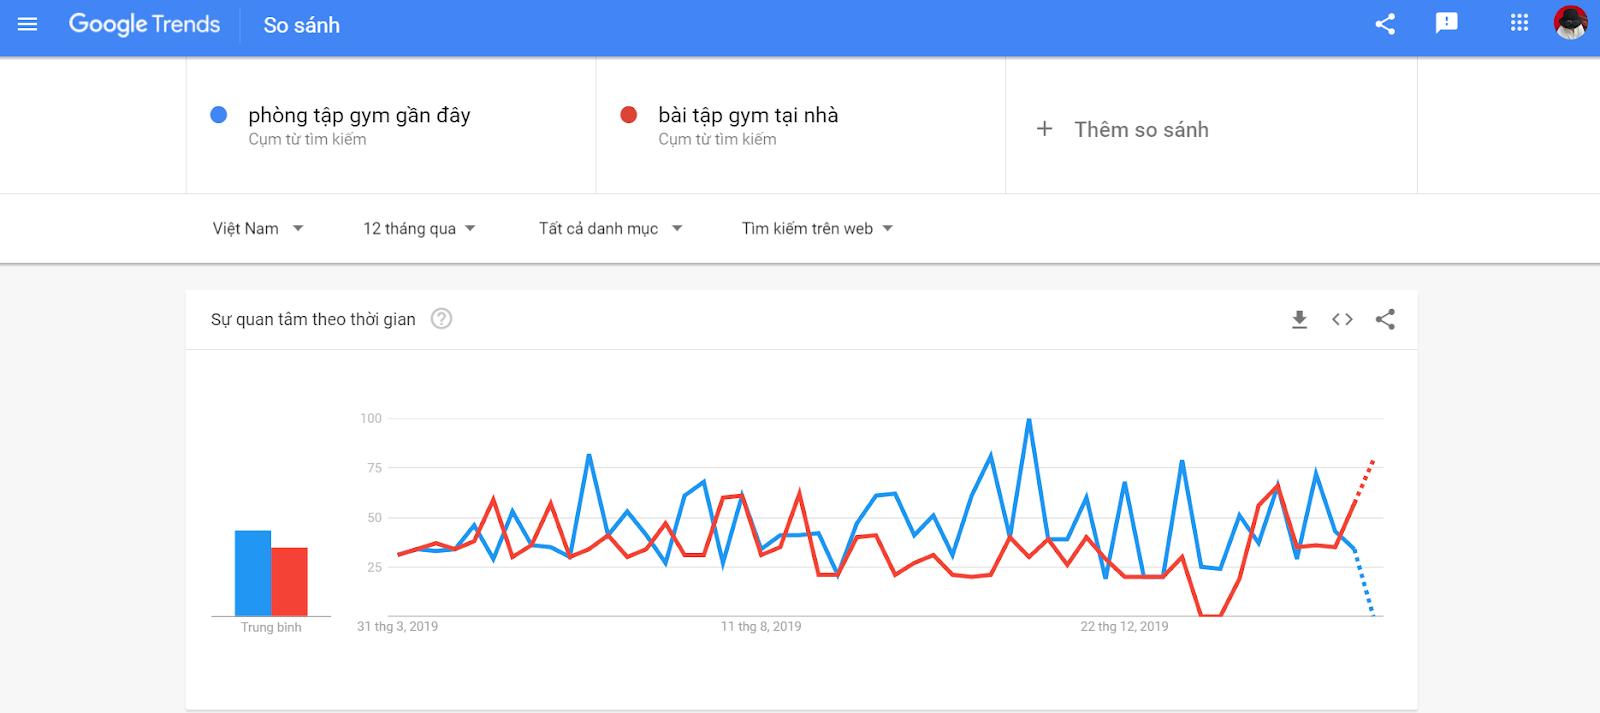 Google trends so sánh